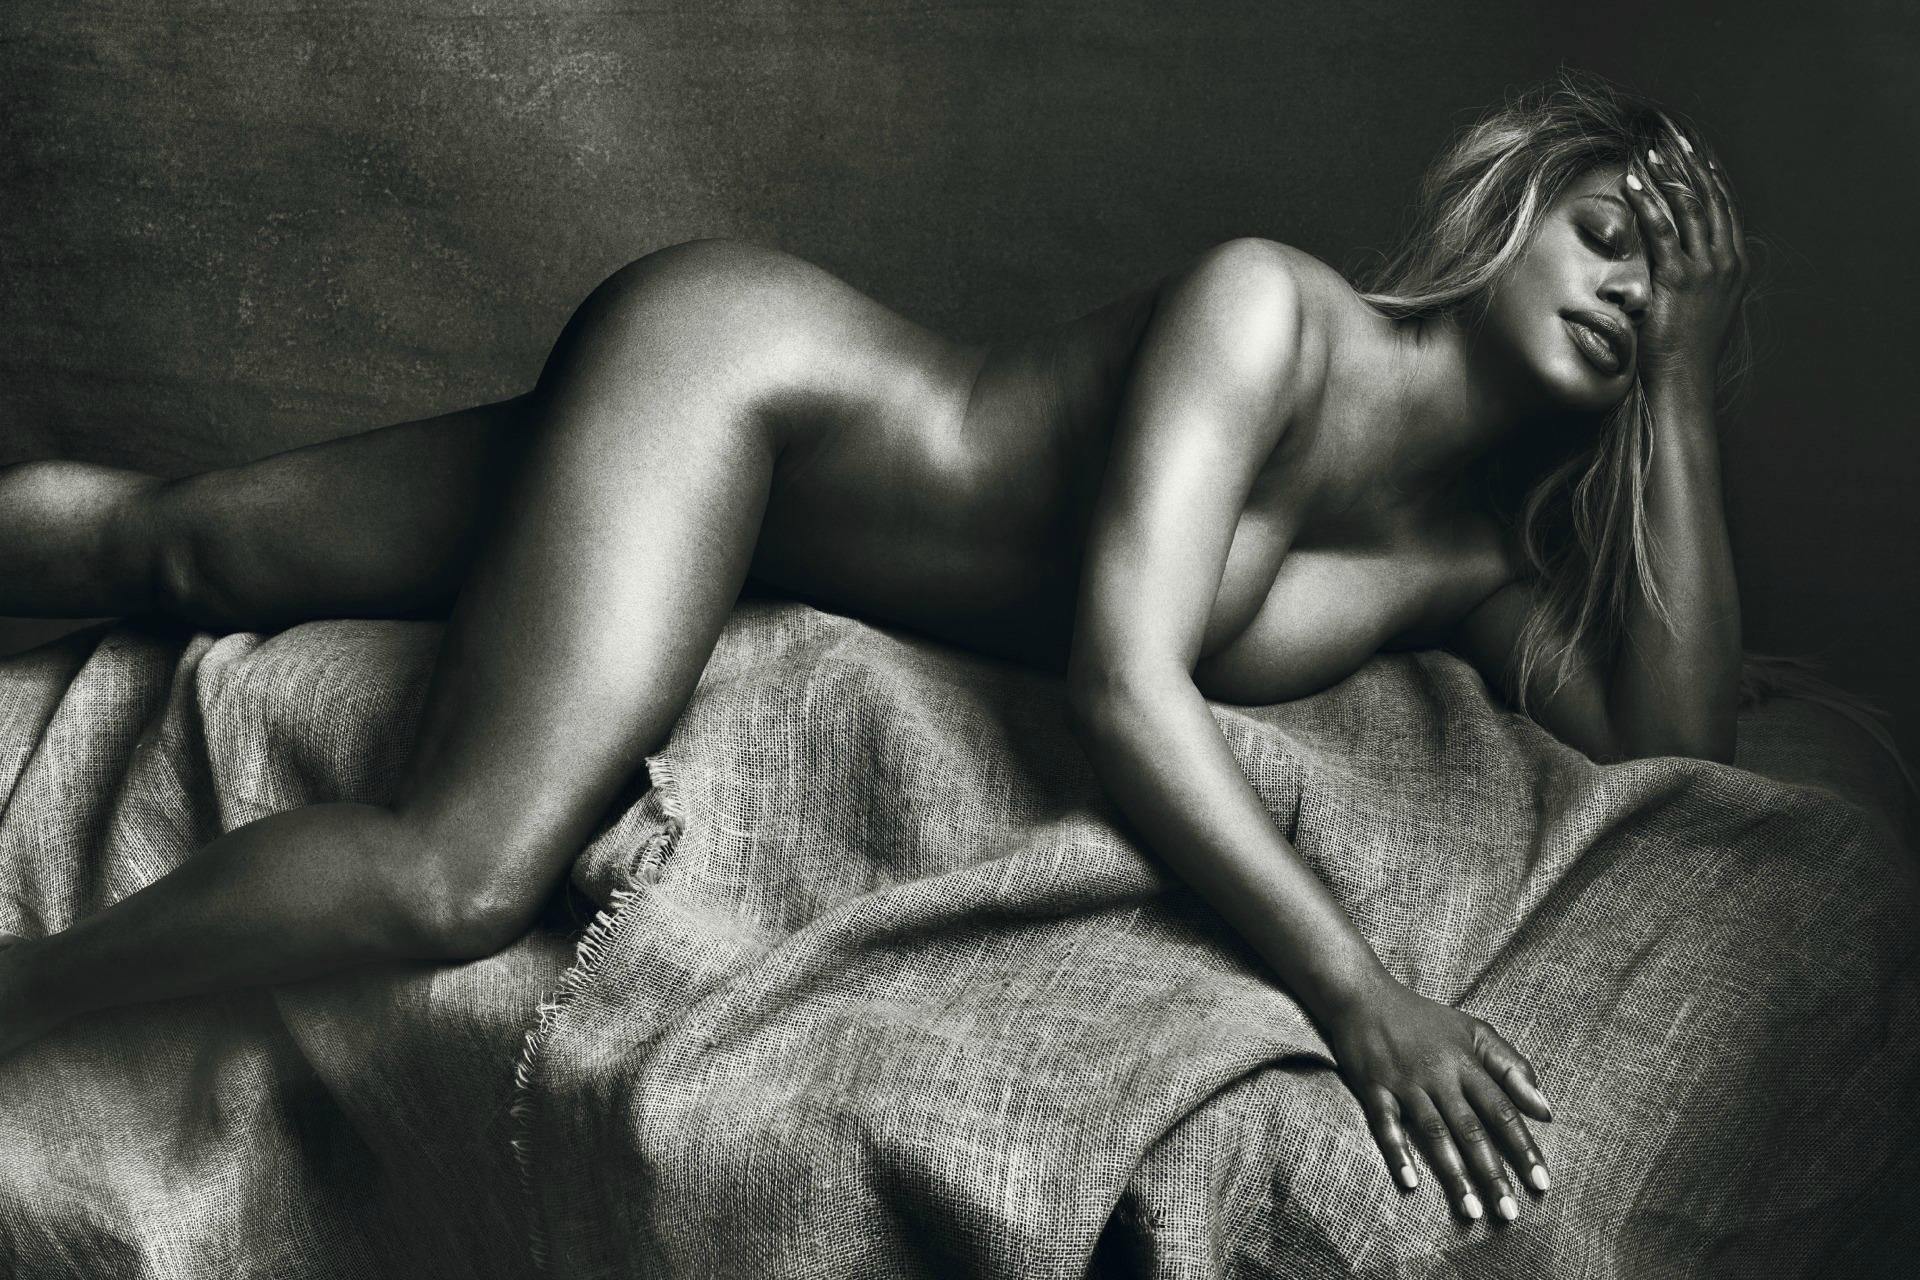 Laverne Cox poses nude for Allure magazine's feature